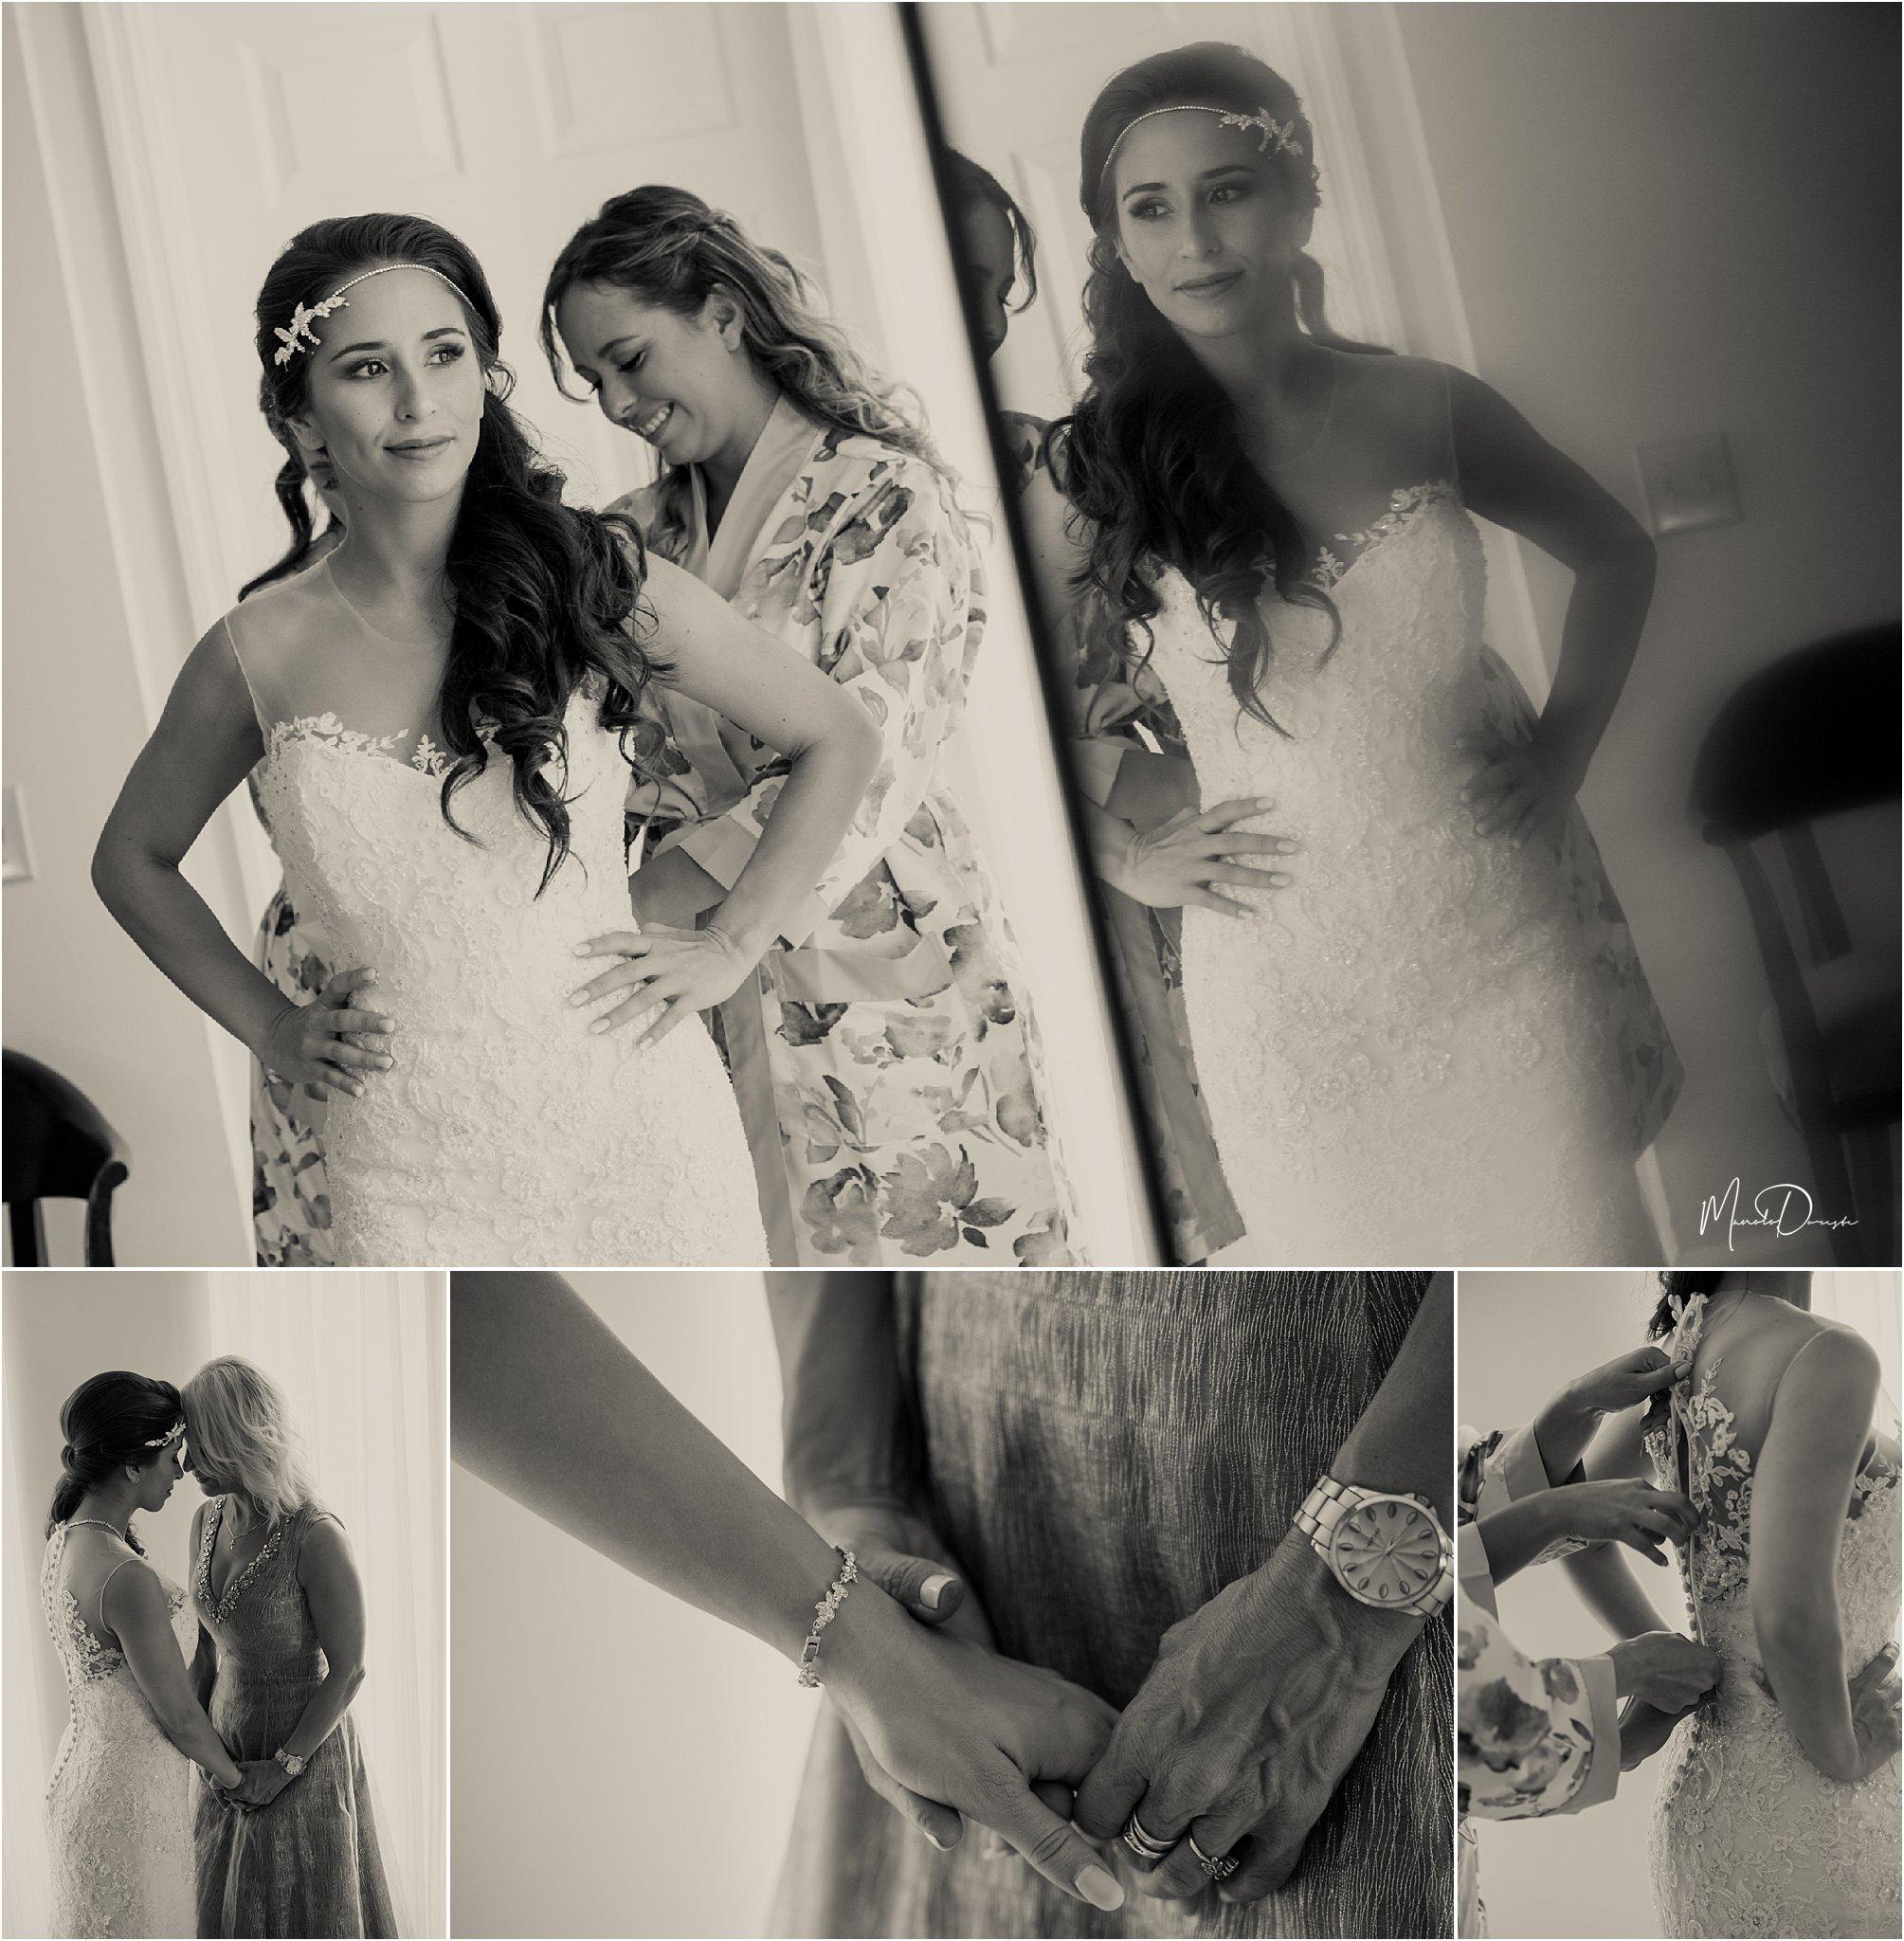 0153_ManoloDoreste_InFocusStudios_Wedding_Family_Photography_Miami_MiamiPhotographer.jpg